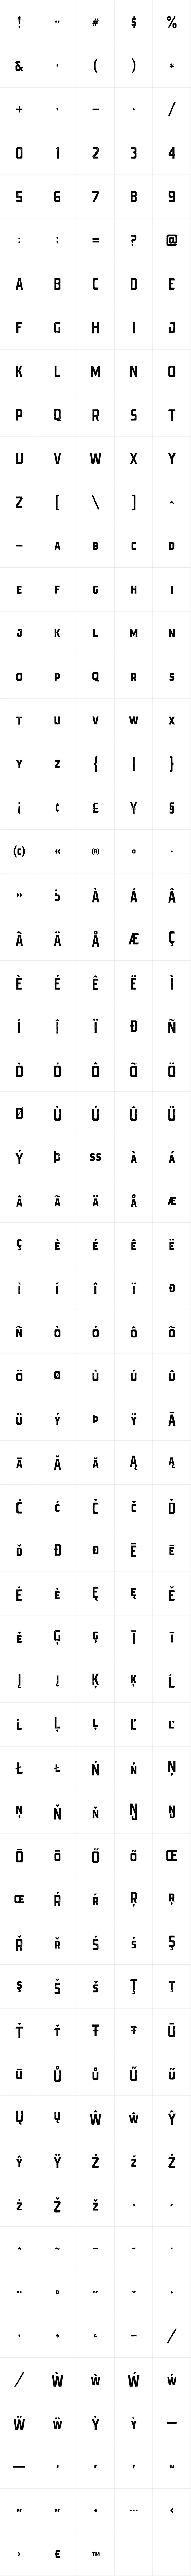 Bartender Sans Letterpress